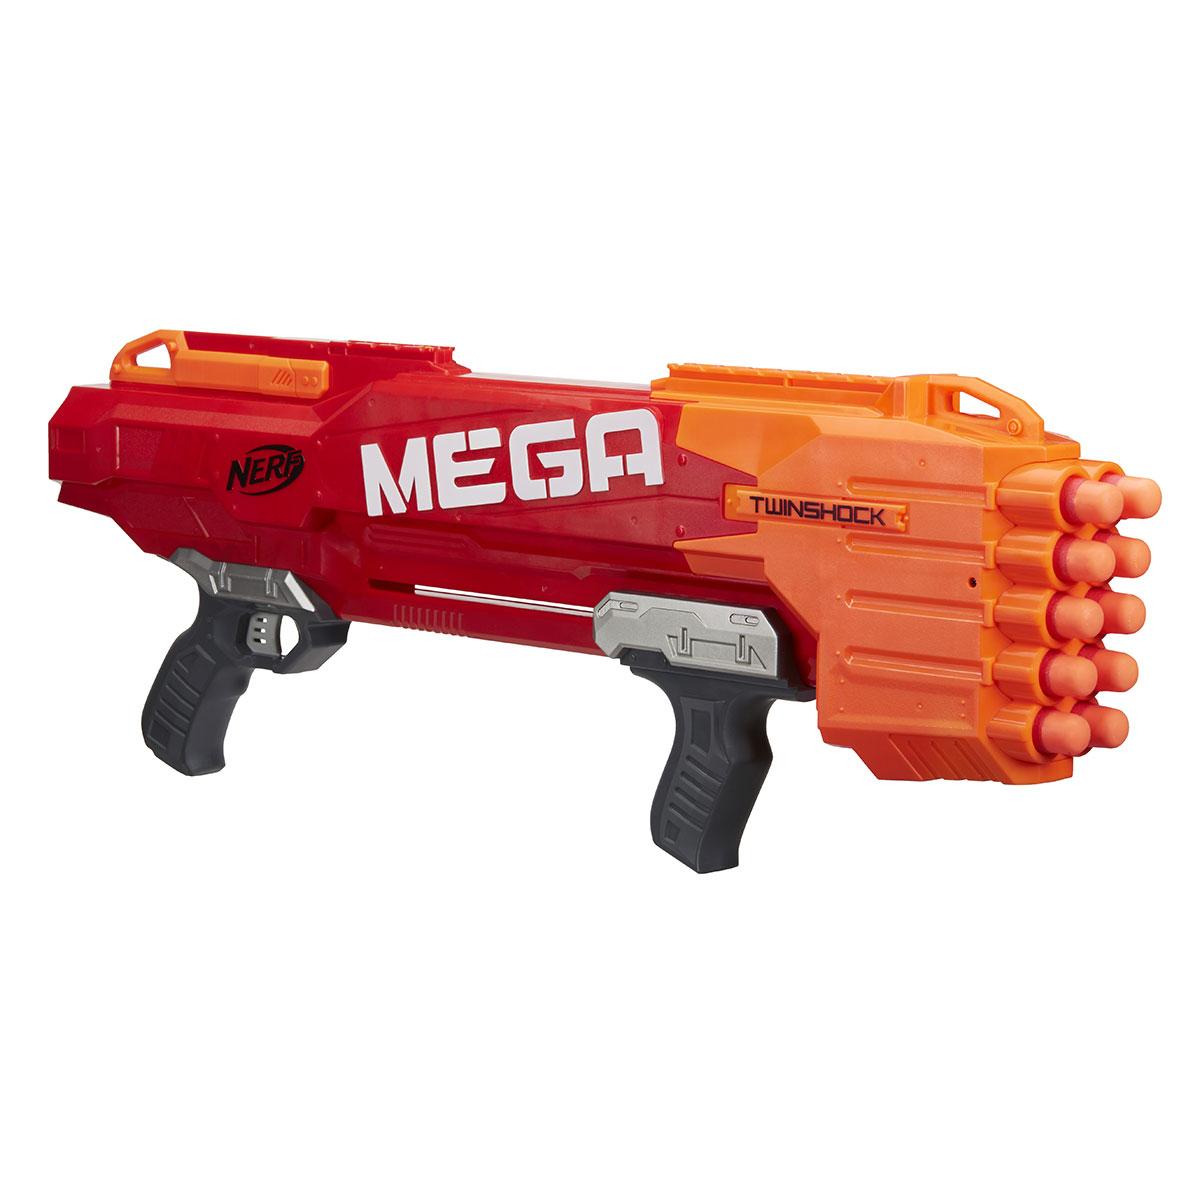 Nerf blaster - Mega Twinshock